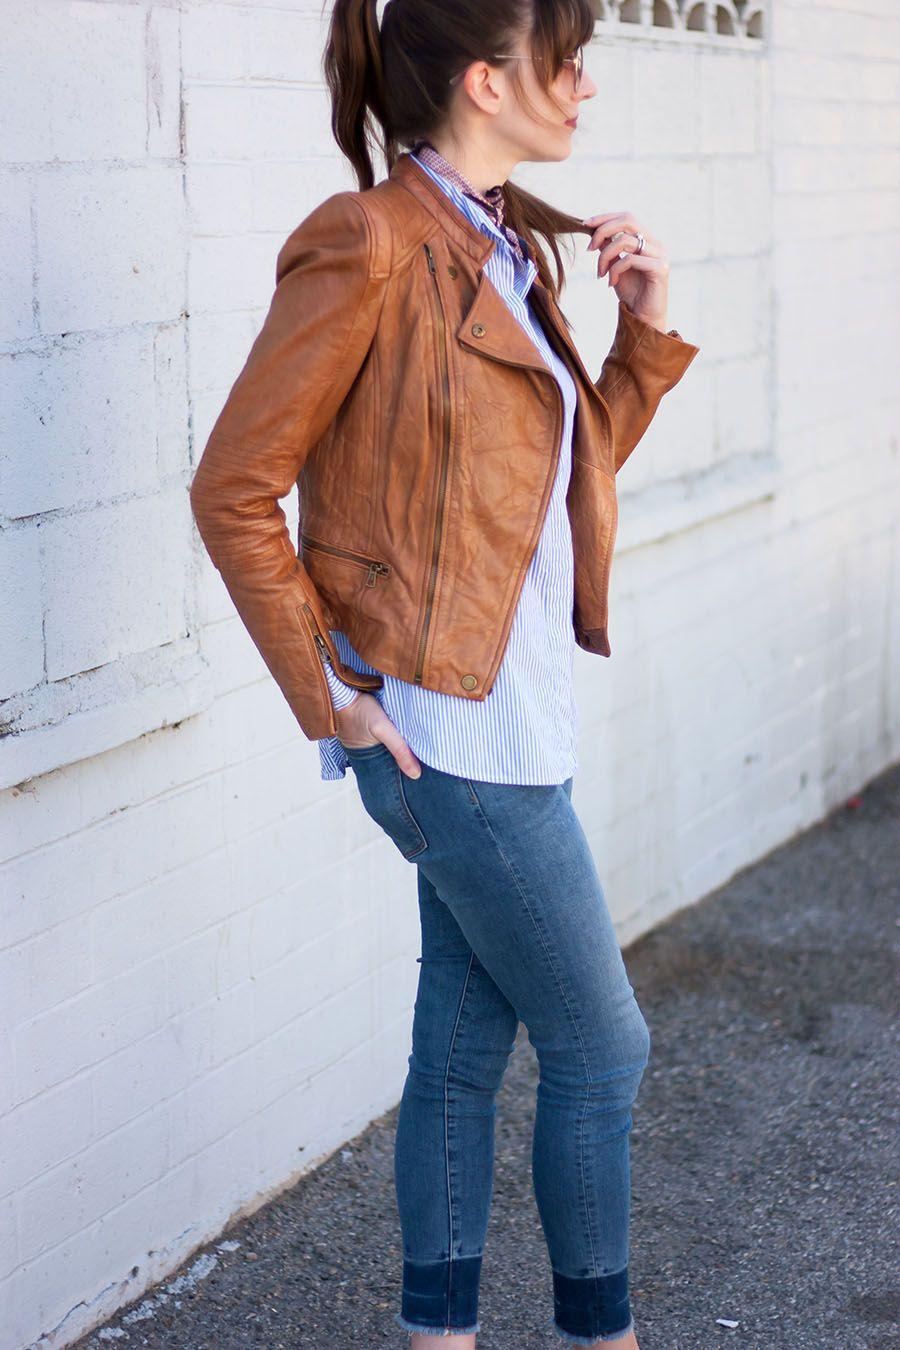 Zara Cognac Leather Jacket Los Angeles Street Style Leather Jacket Los Angeles Street Style Jackets